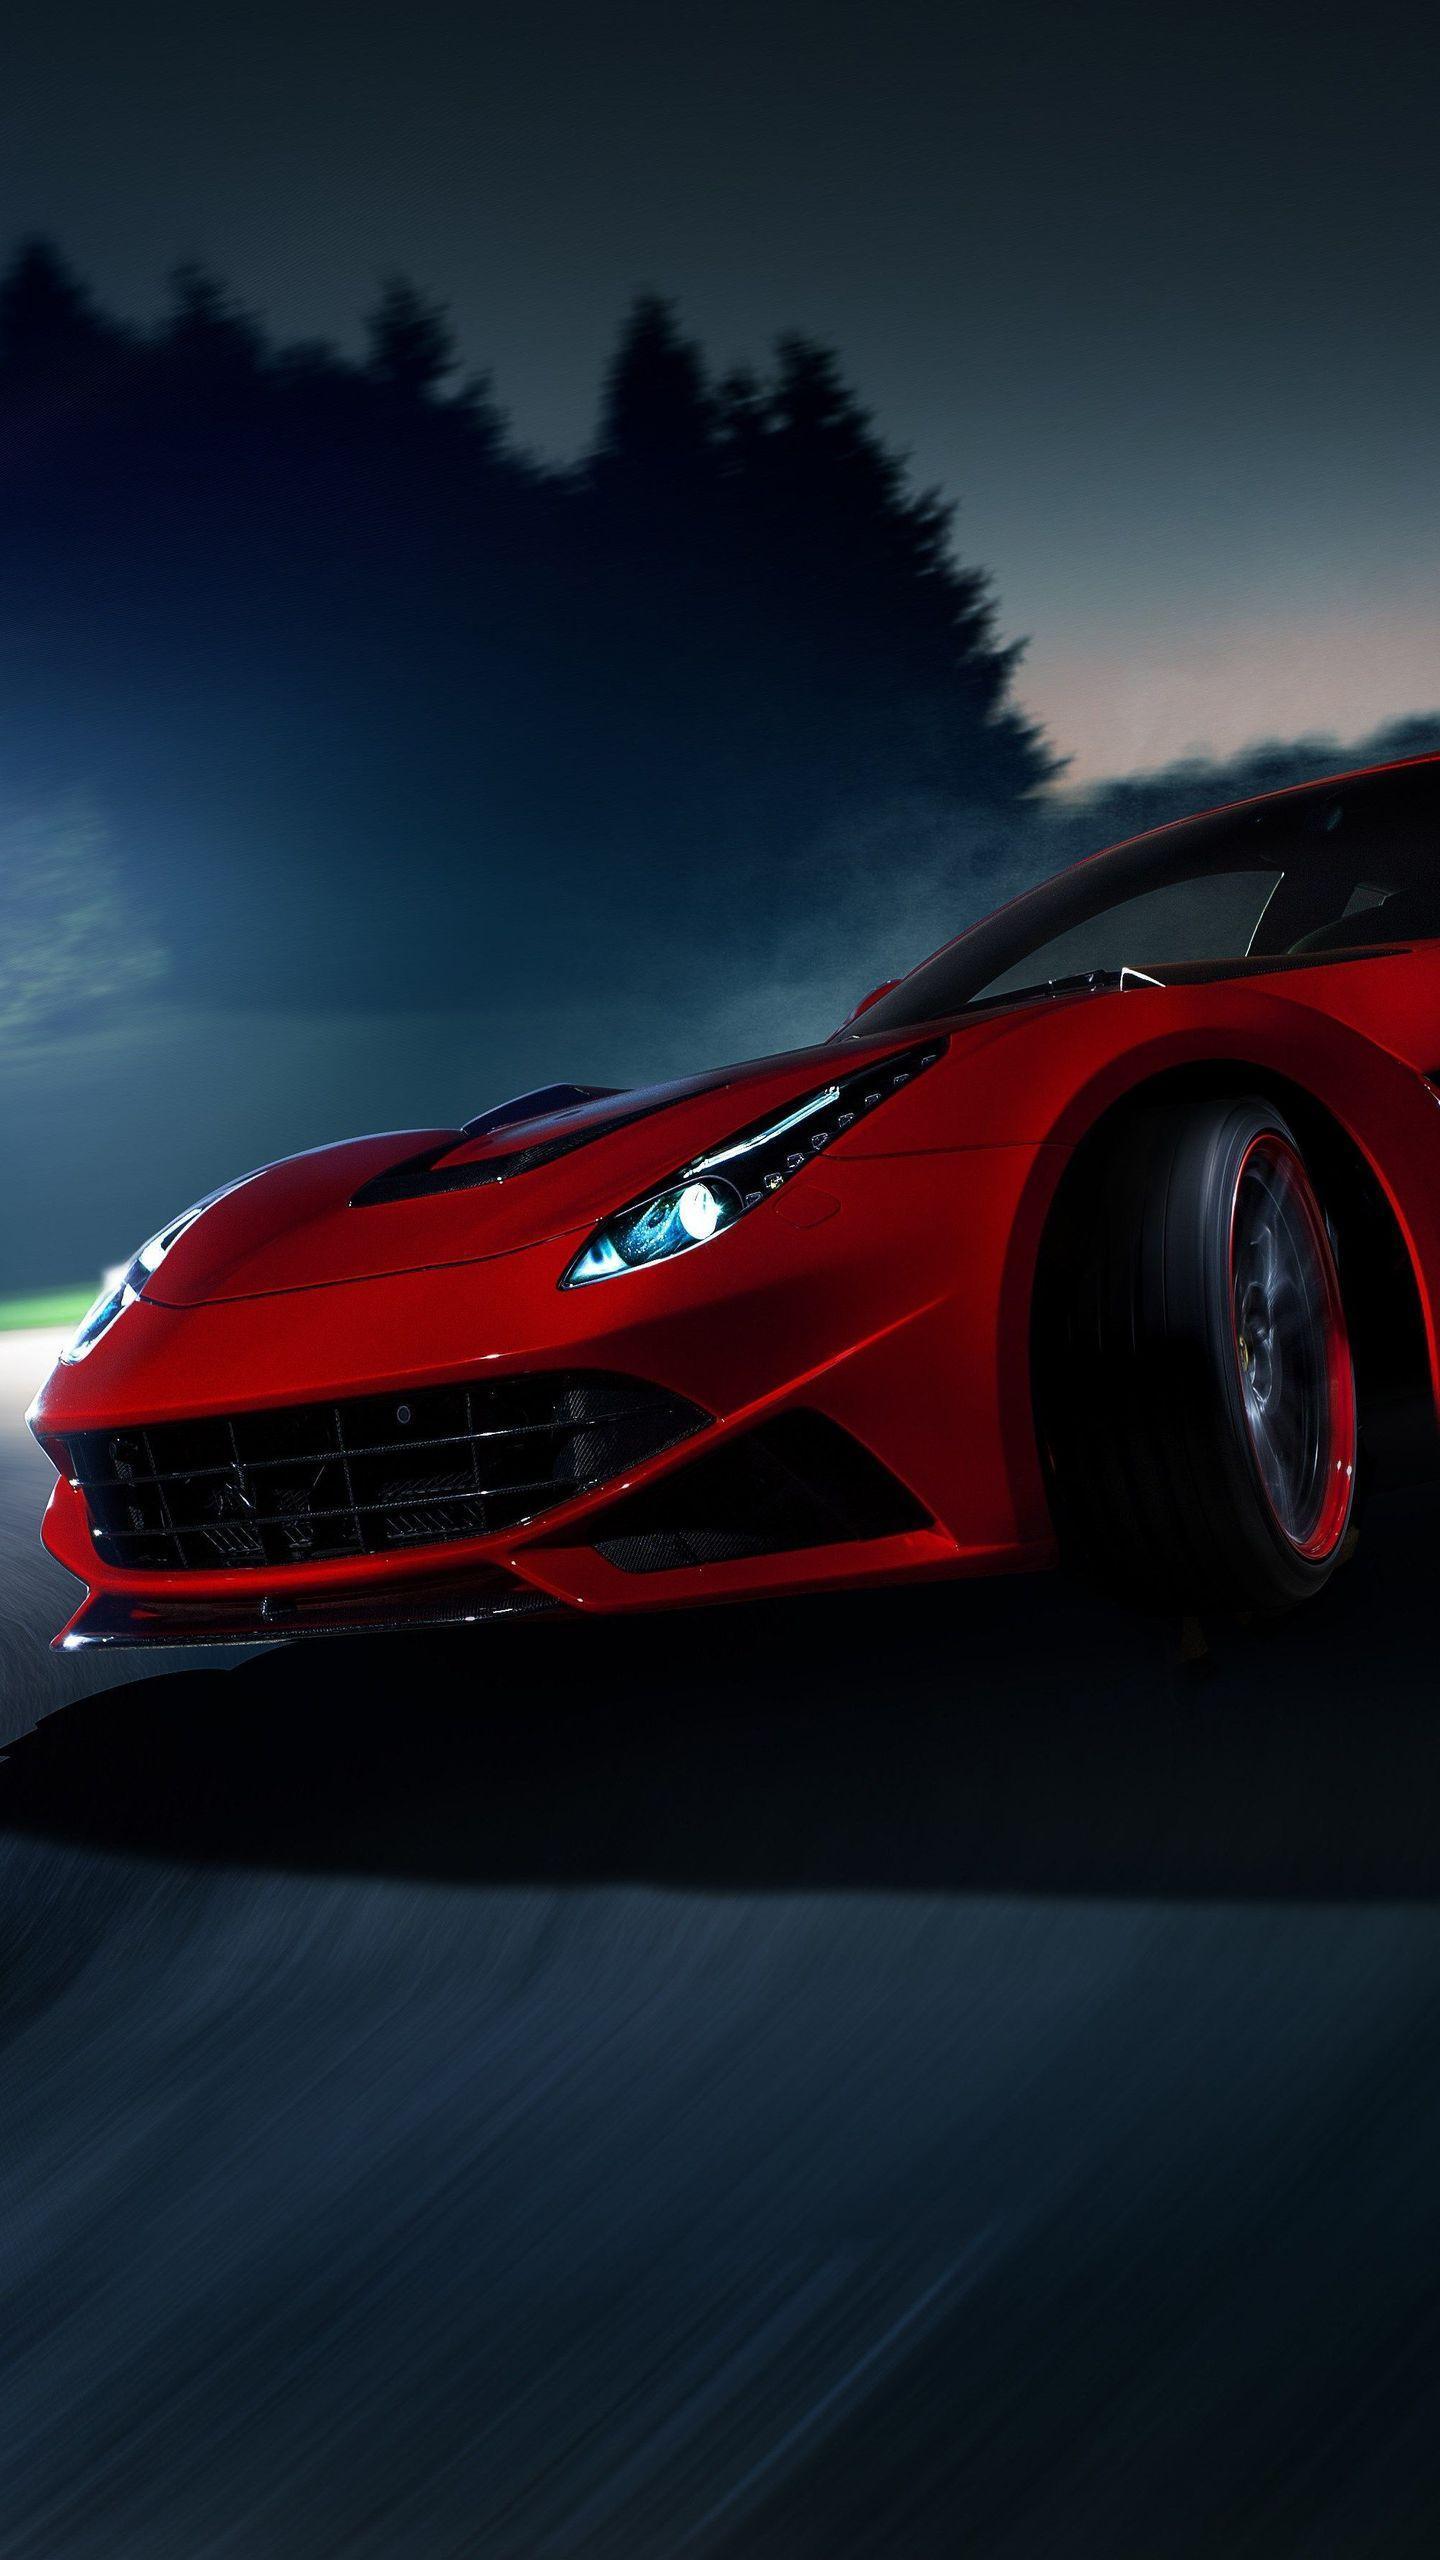 Dark Sport Cars Hd Wallpaper Offline For Android Apk Download